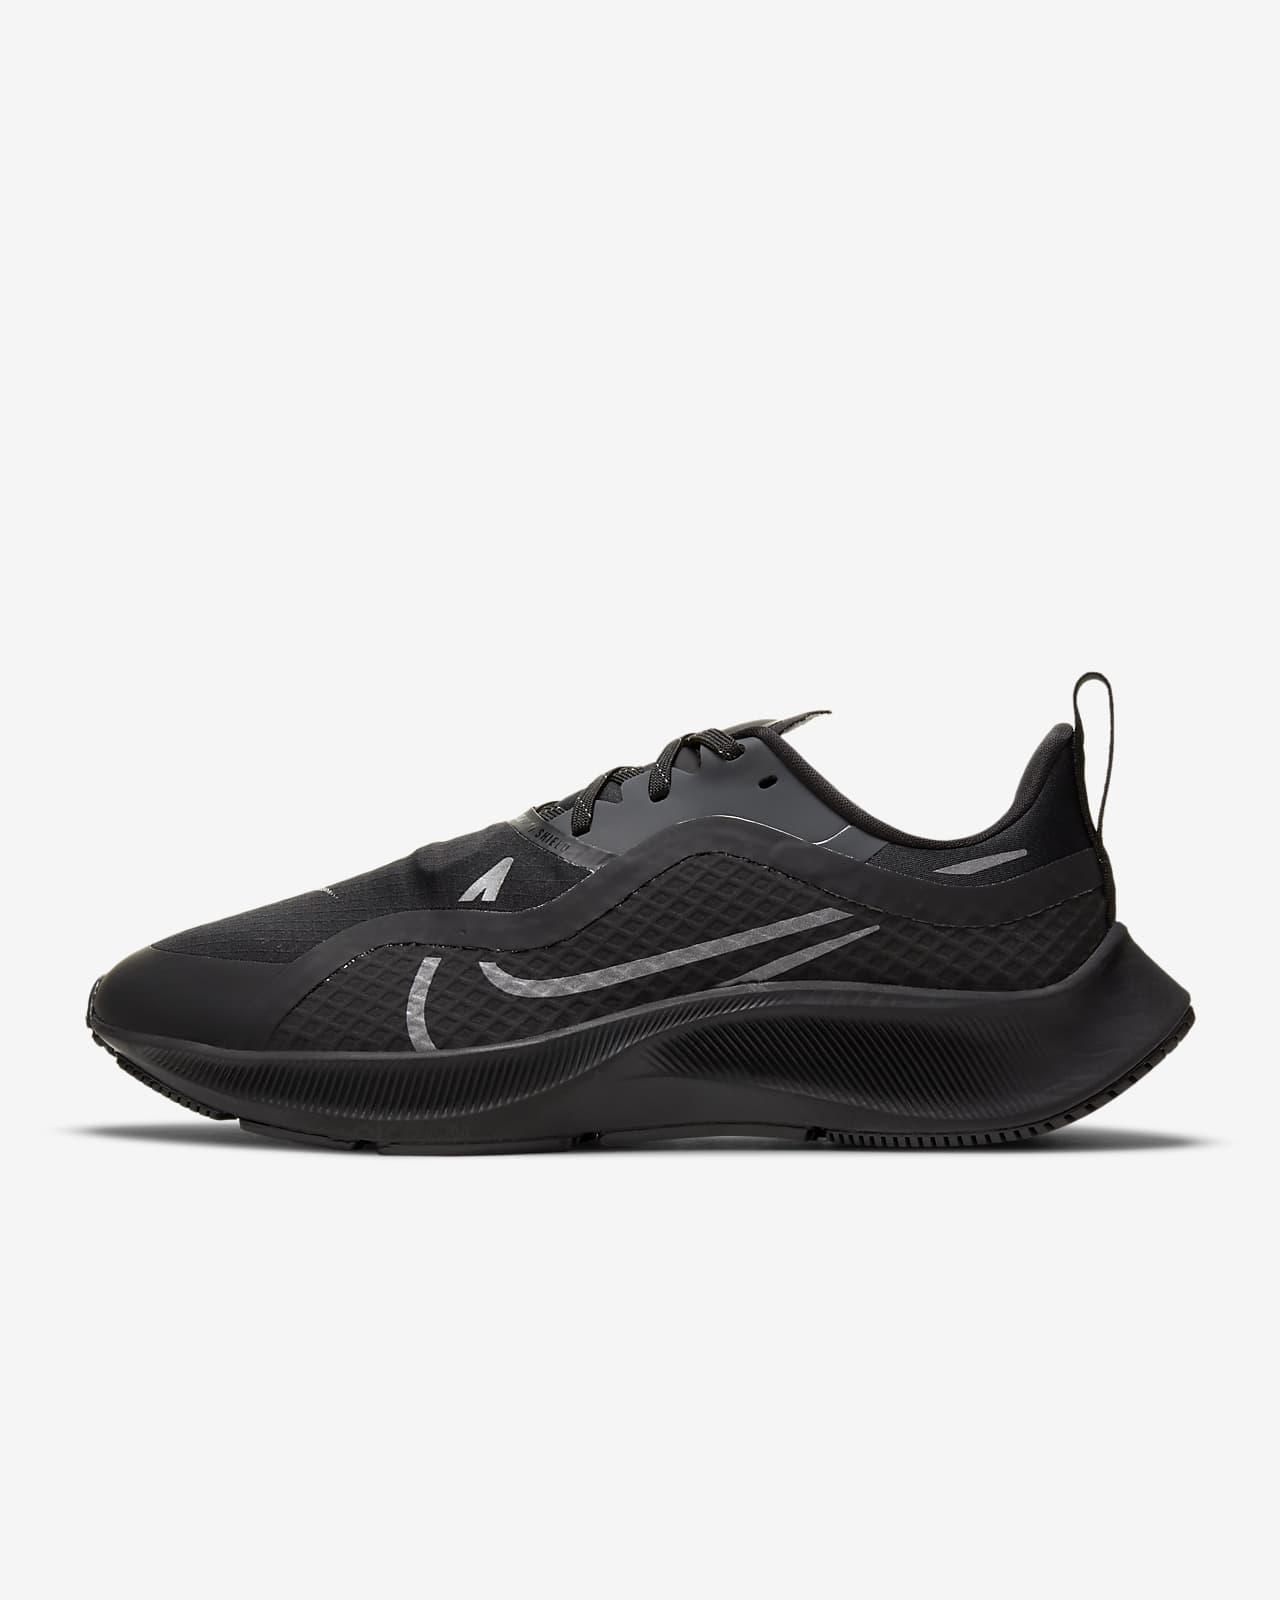 Chaussure de running Nike Air Zoom Pegasus 37 Shield pour Femme